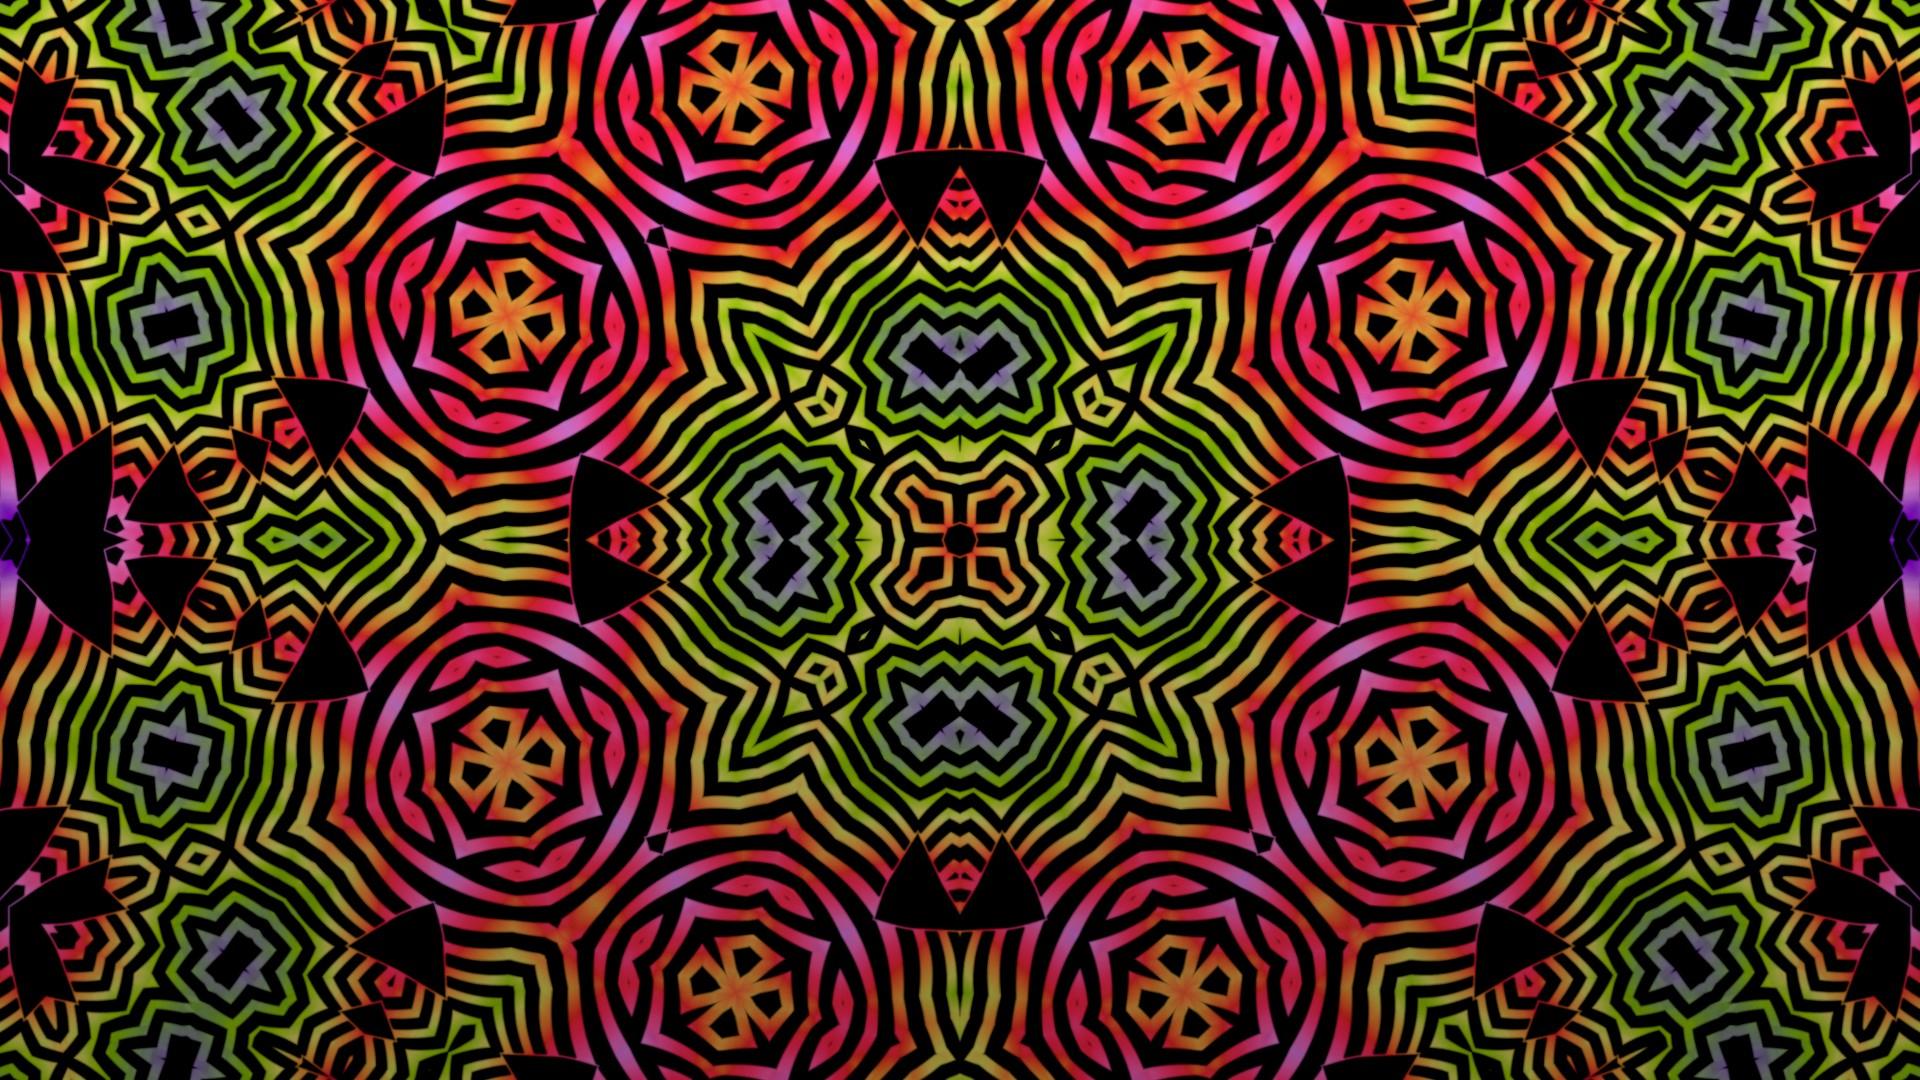 Good Wallpaper Mac Trippy - prxsEc  Collection_599054.jpg